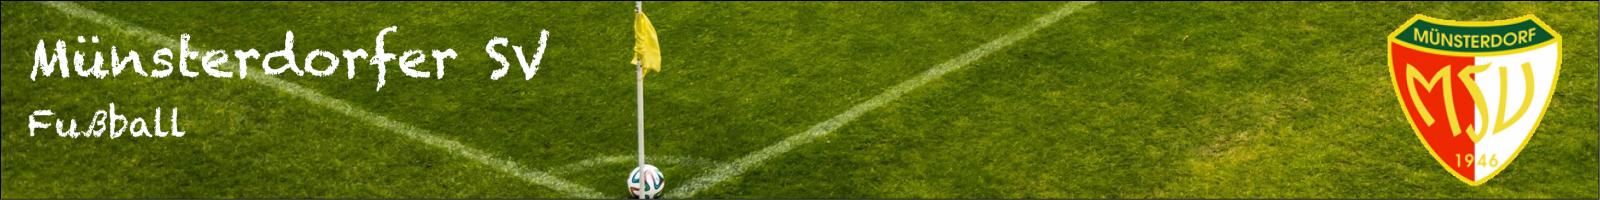 Münsterdorfer SV